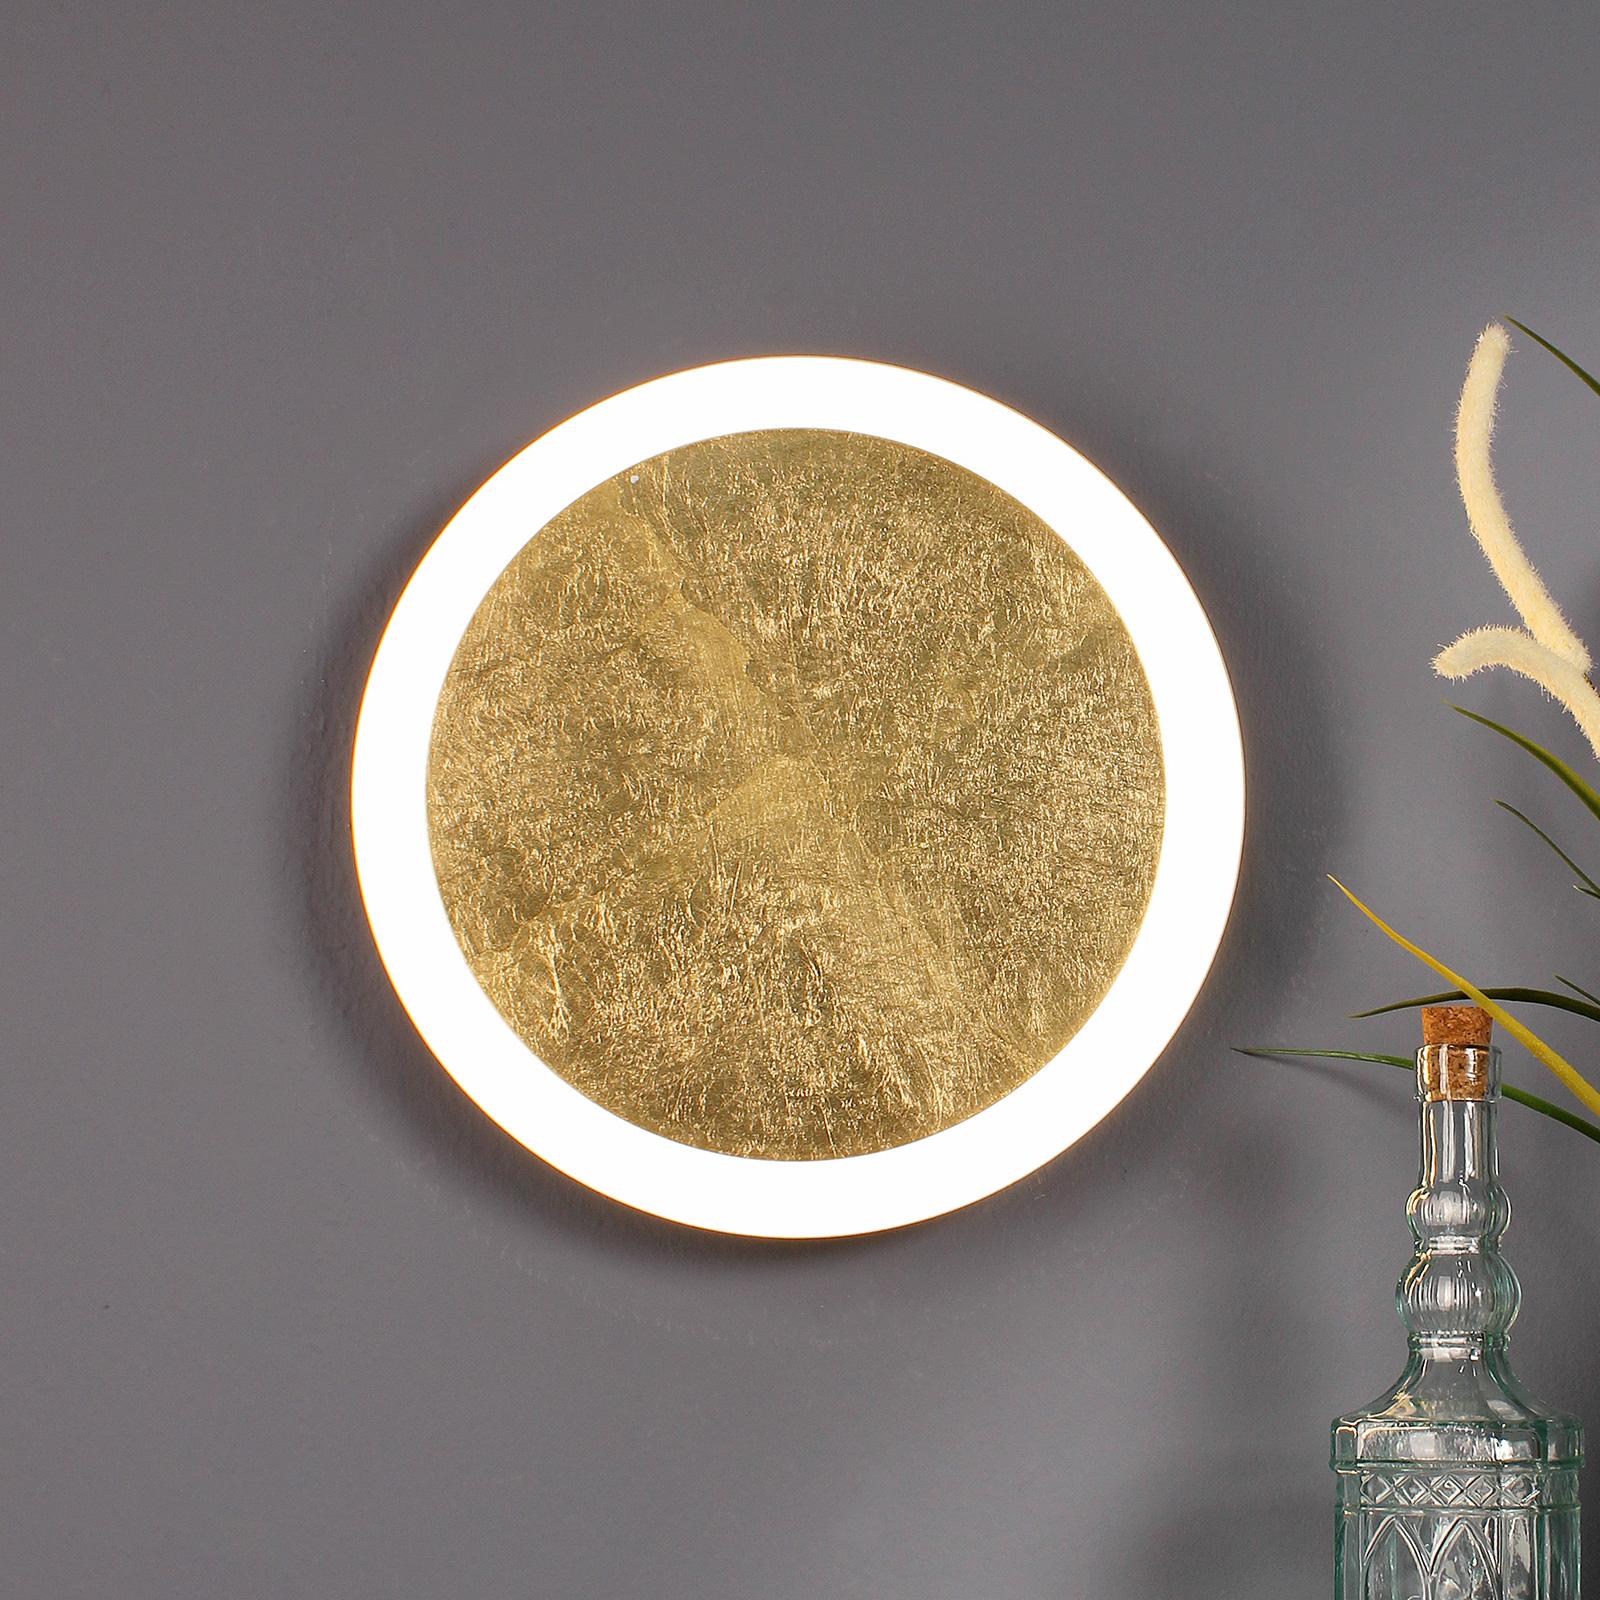 Lampa sufitowa LED Moon Ø 30 cm, złota